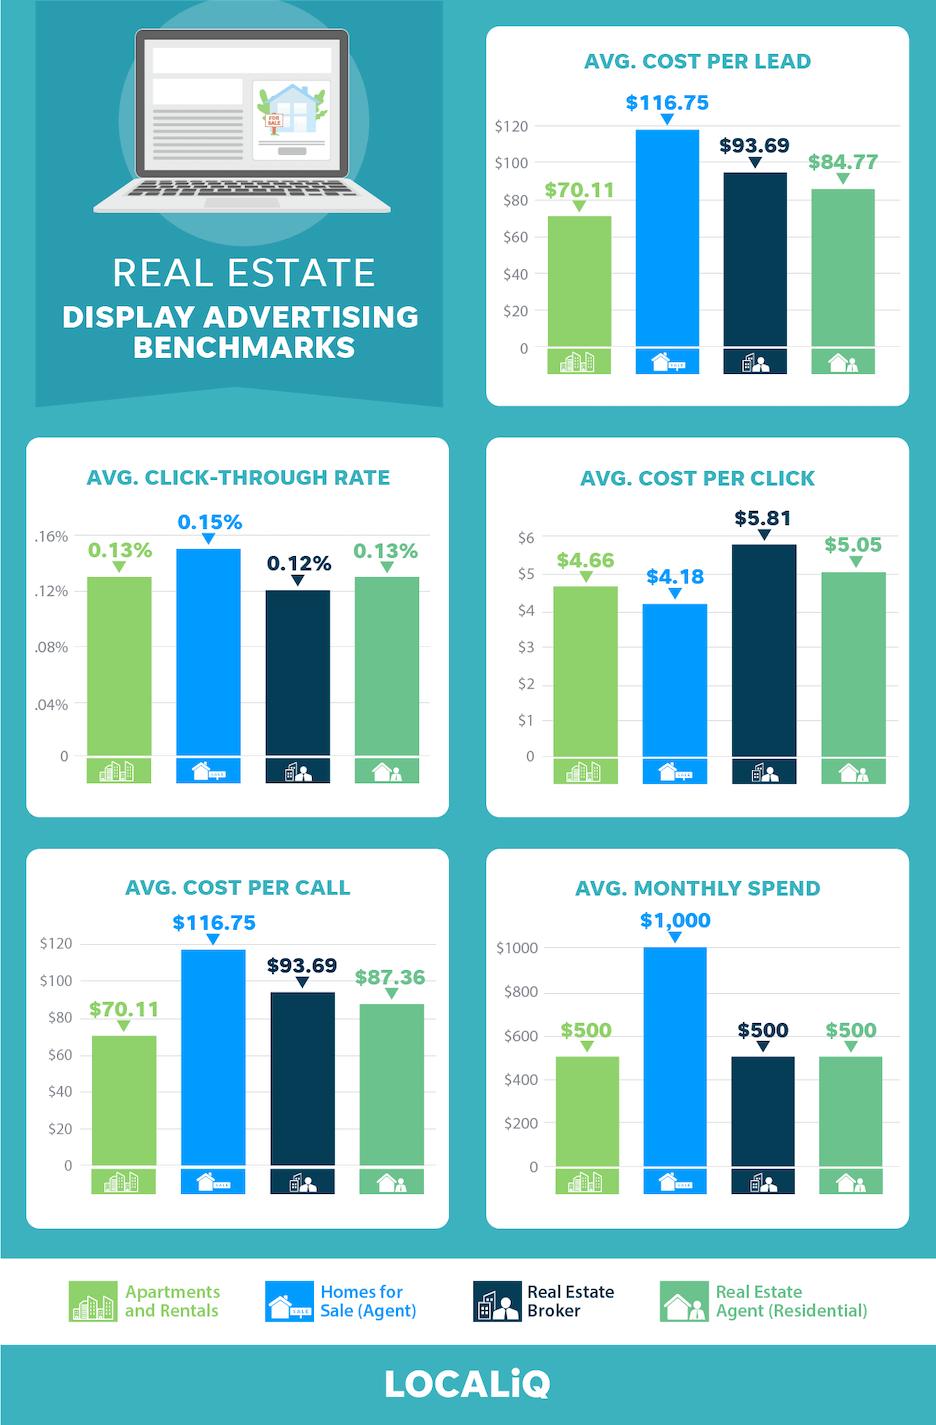 real estate advertising benchmarks 2021 - display